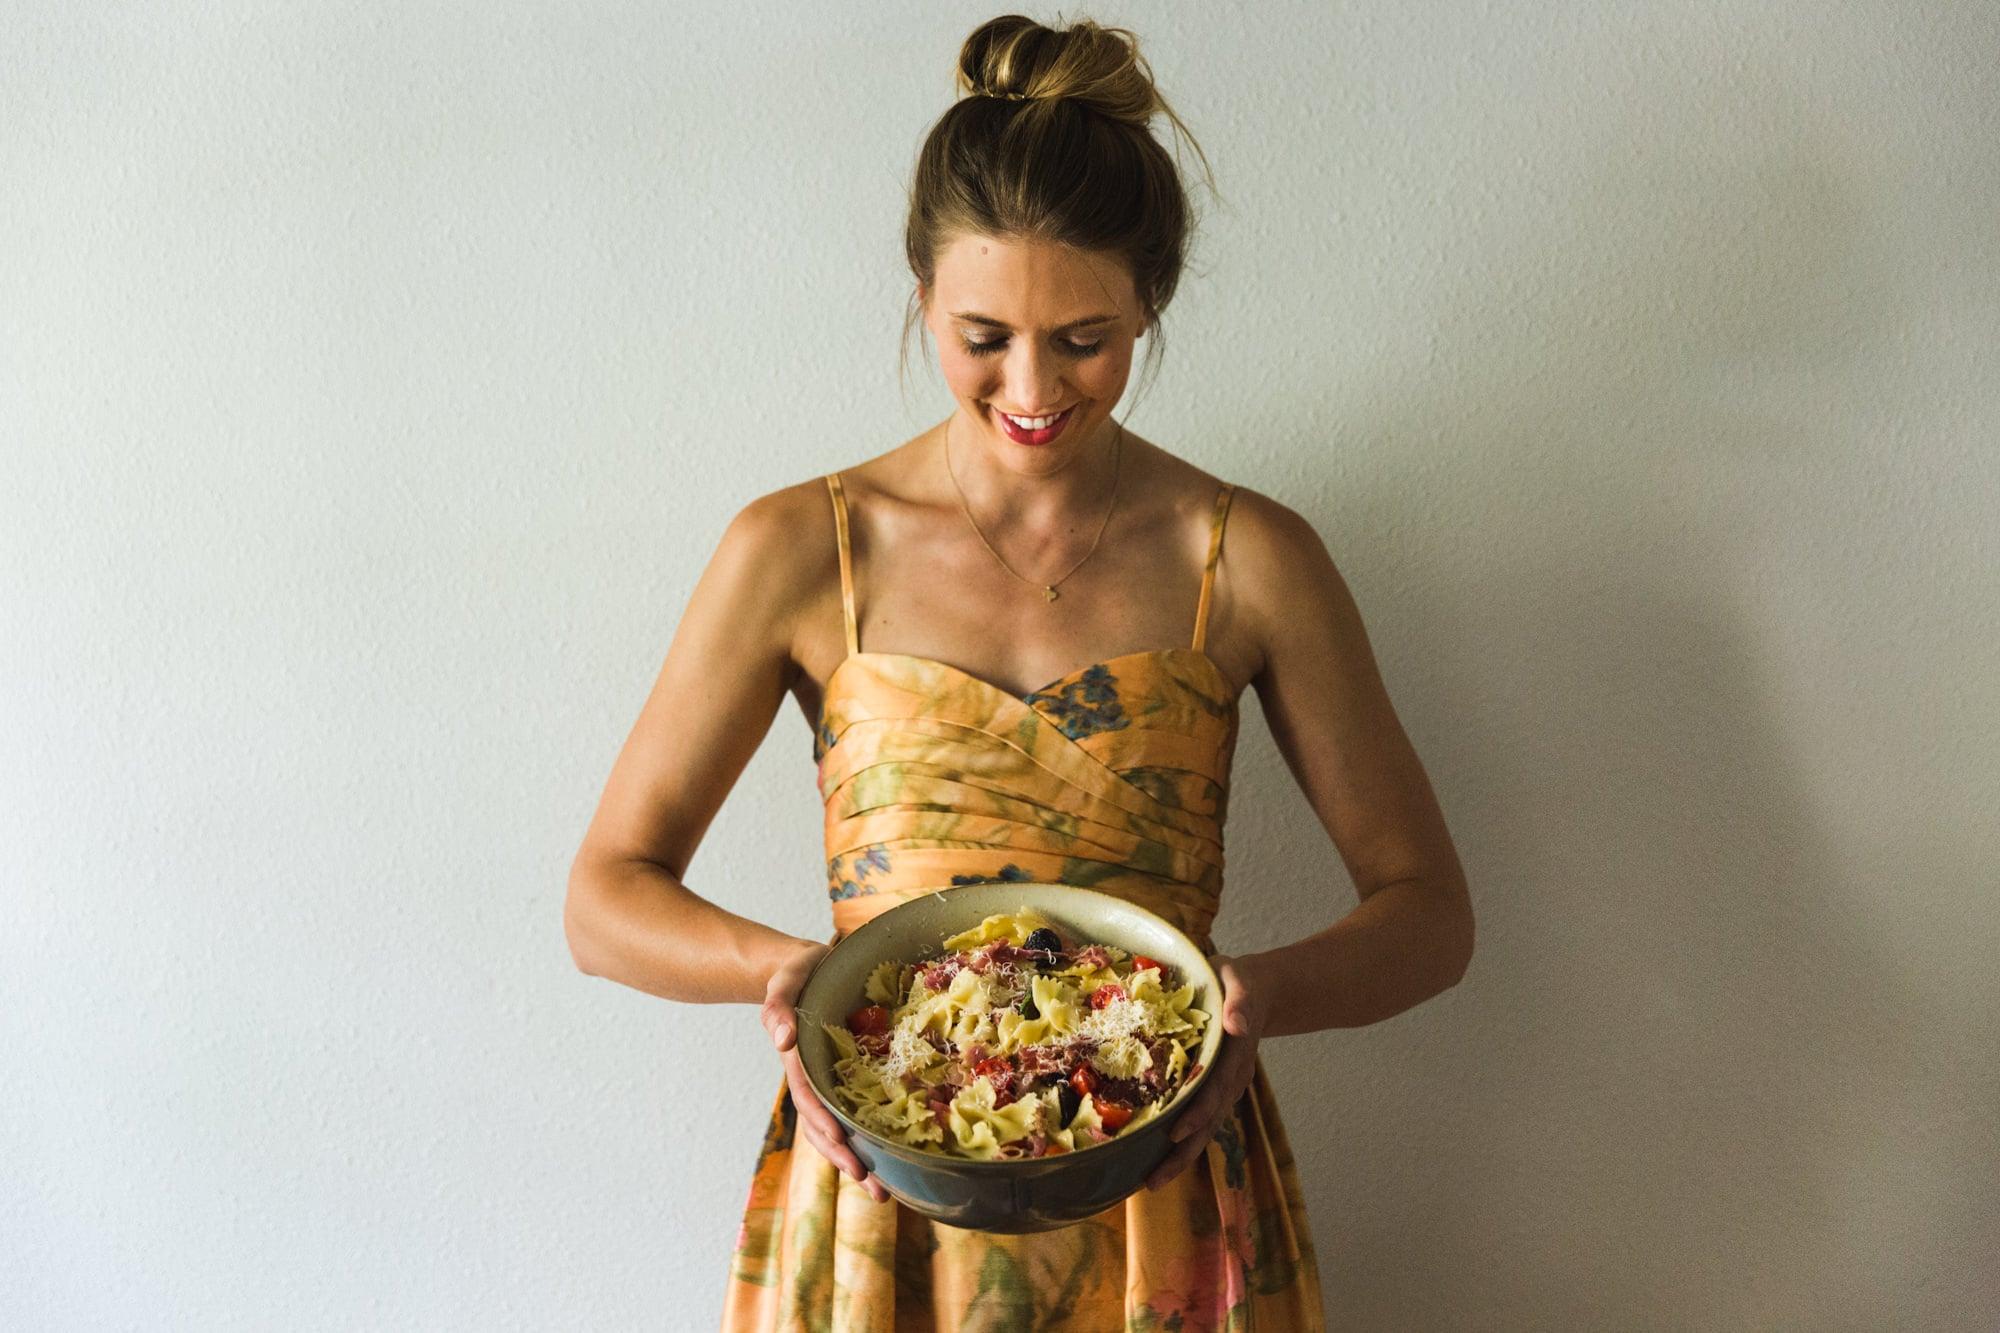 fig-prosciutto-pasta-salad-recipe-23.jpg